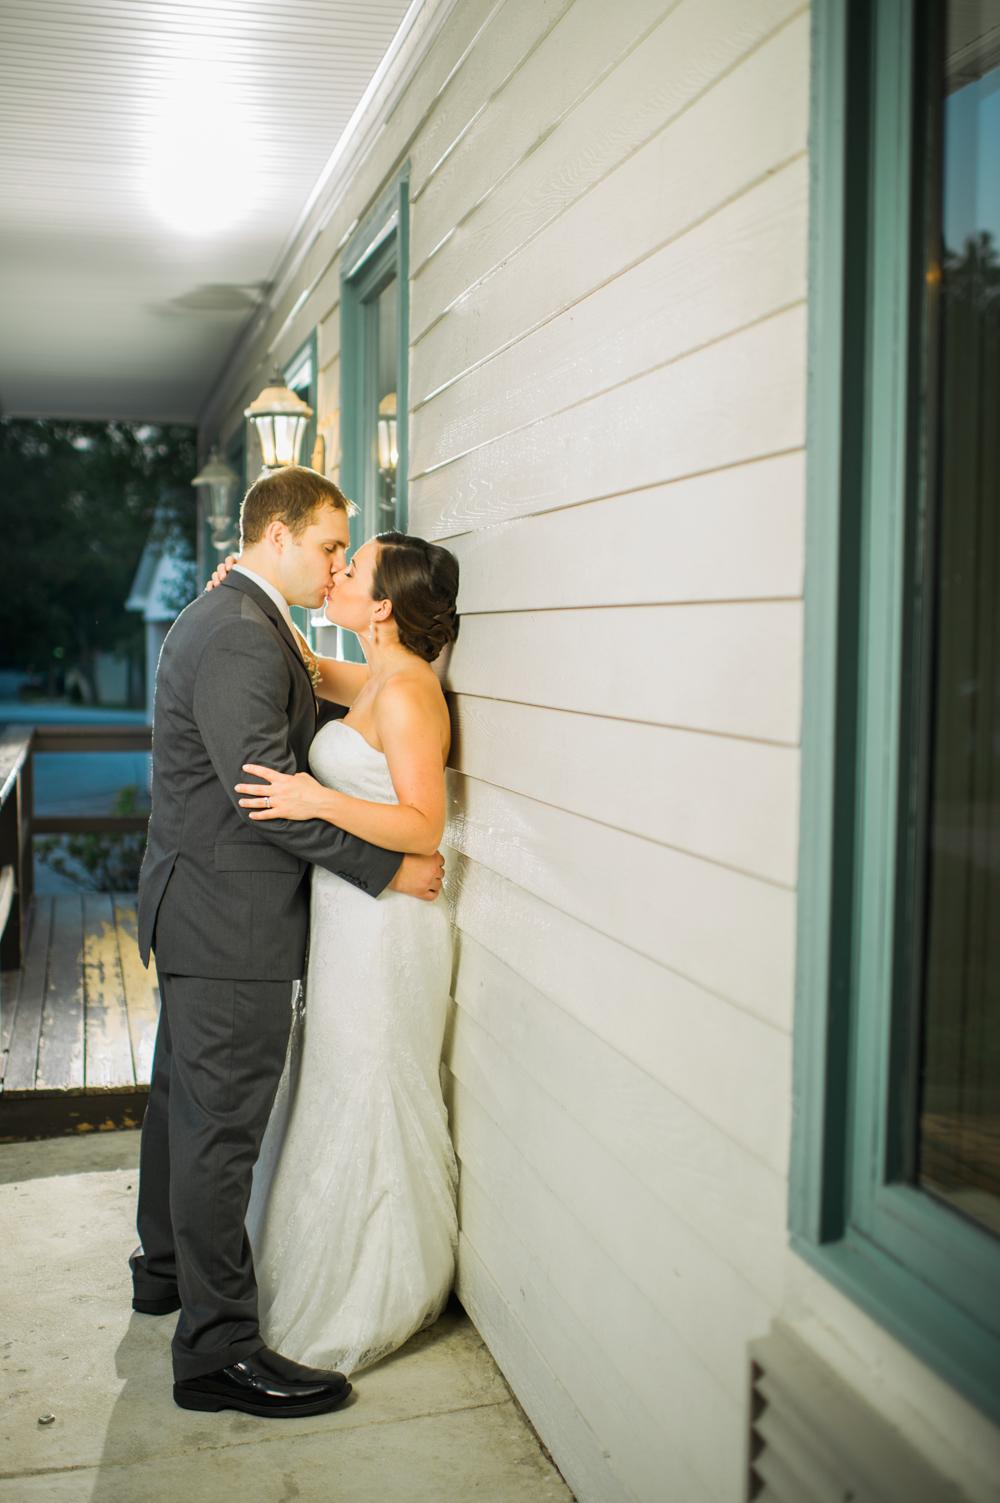 Mendenhall_Inn_Wedding_Pennsylvania_Rebecca_Watkins_Photography_2014-072.jpg